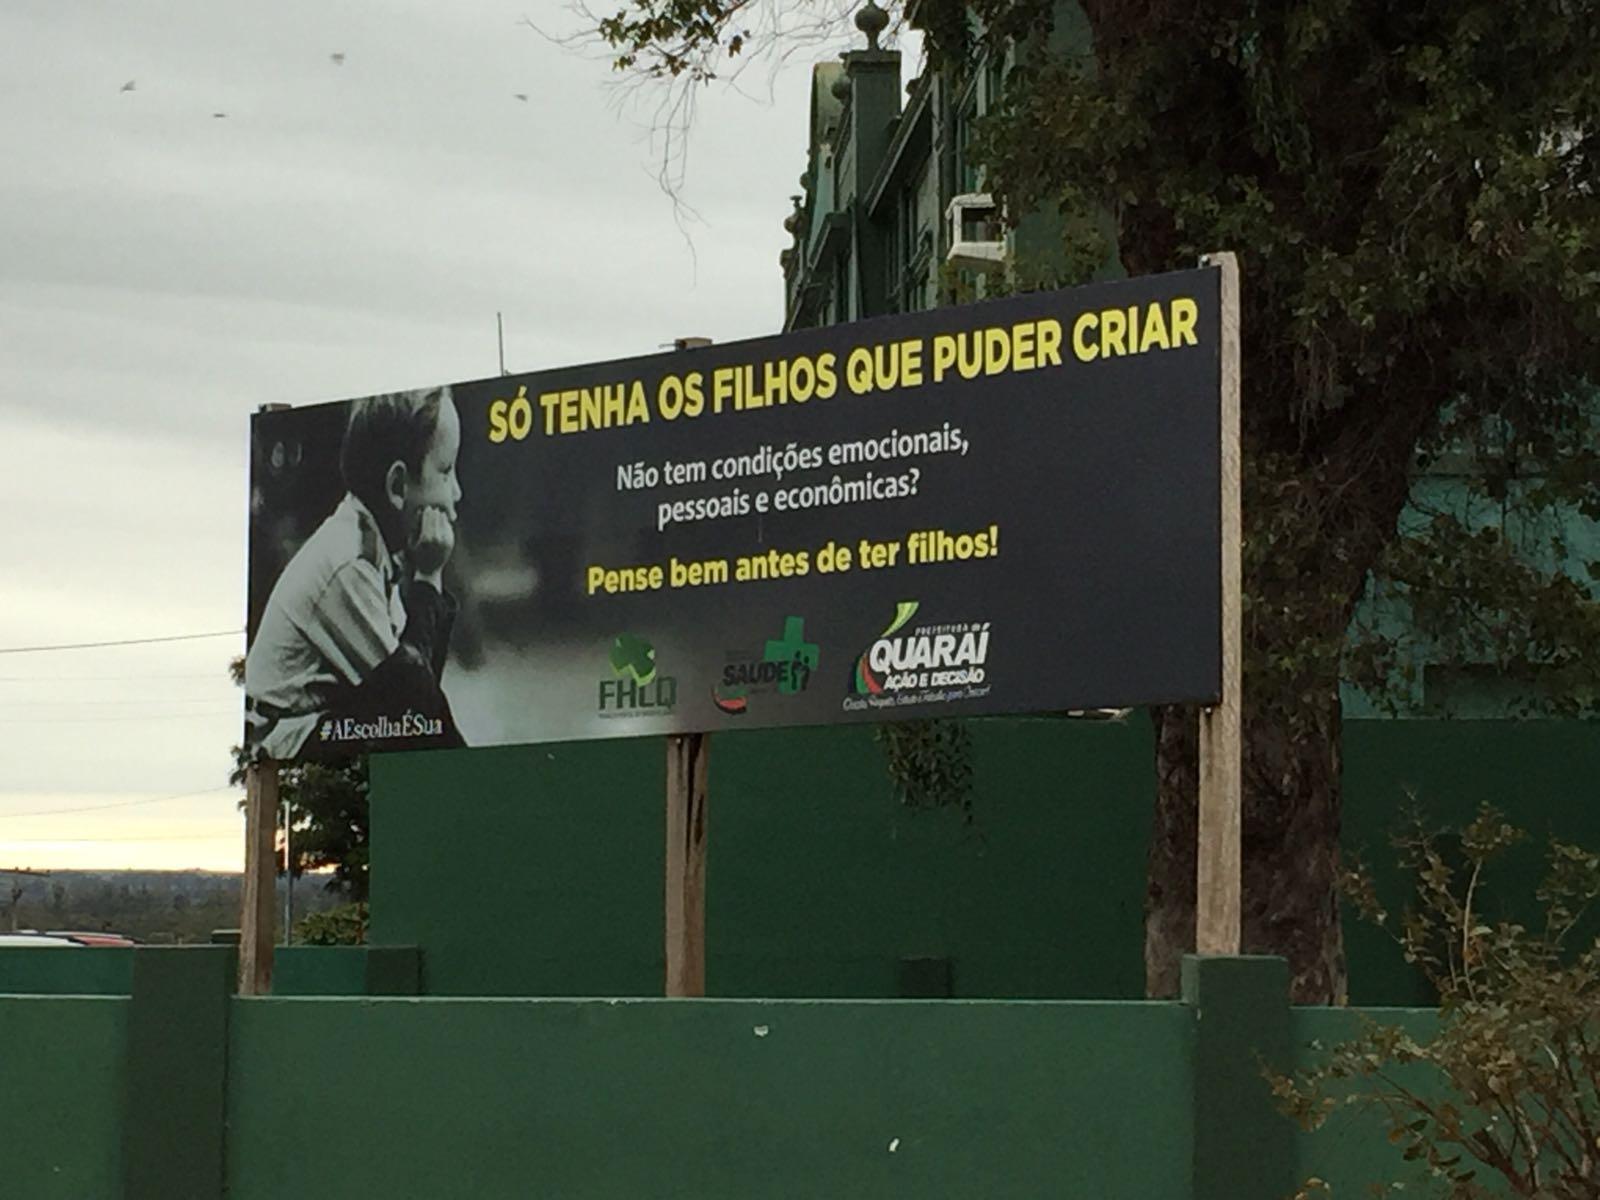 CAMPAÑA DE SALUD EN QUARAÍ GENERA POLÉMICA EN TODO BRASIL «SO TENHA OS FILHOS QUE PUEDA CRIAR»